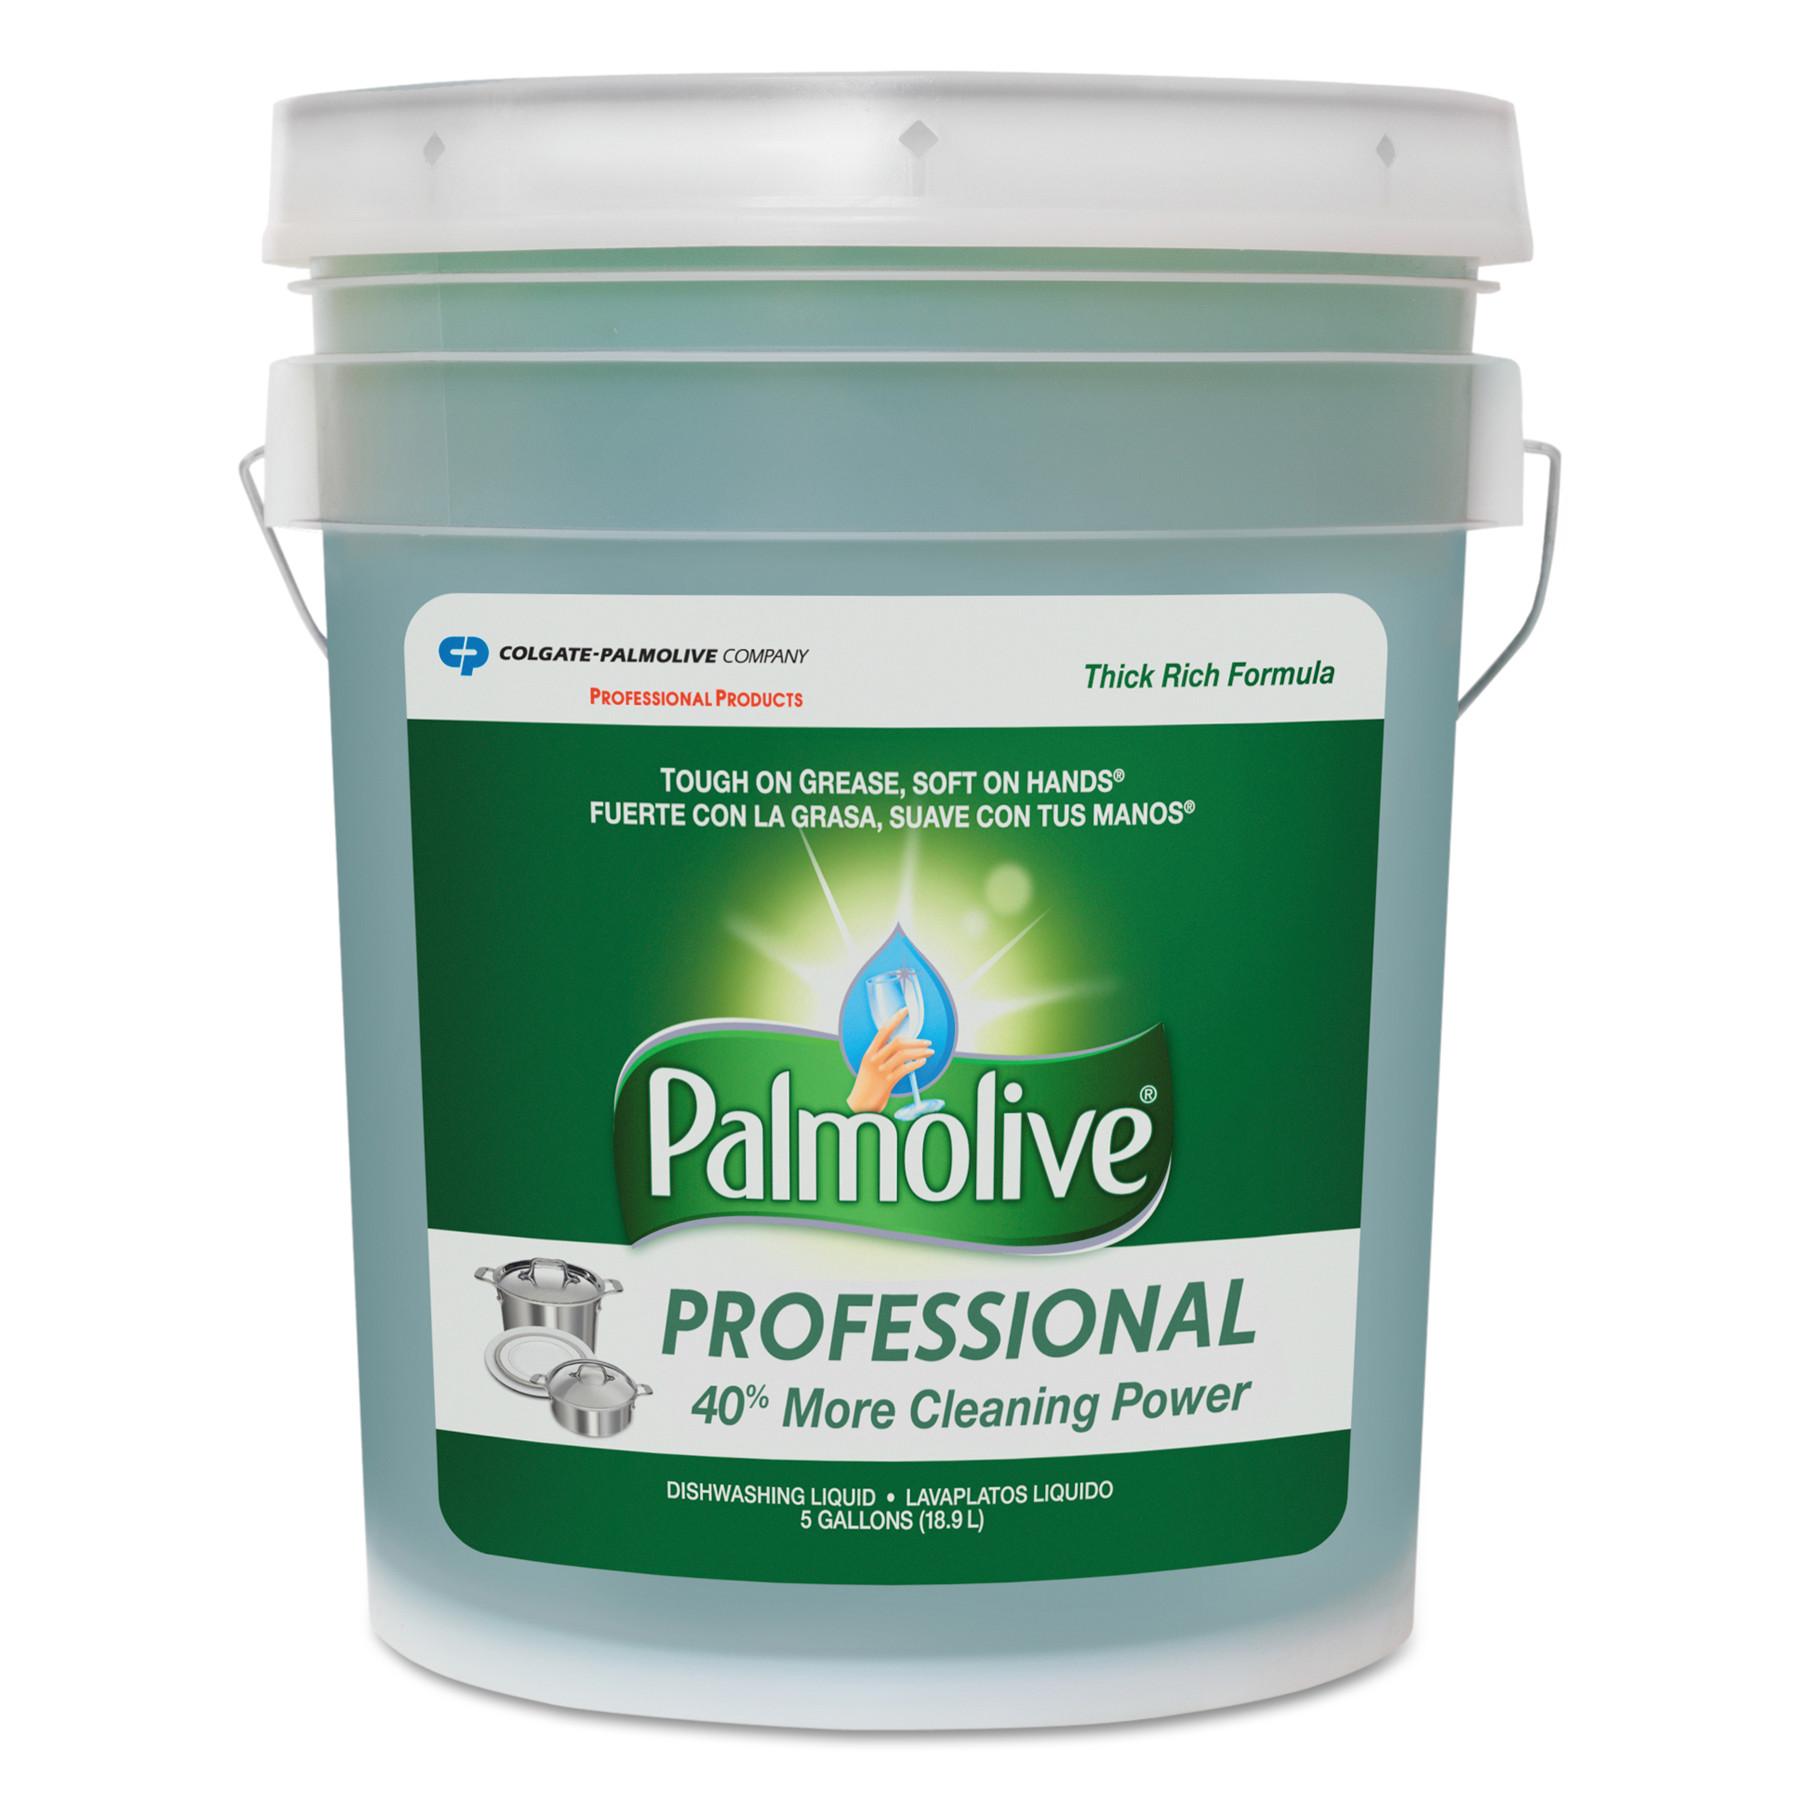 Palmolive Dishwashing Liquid, Original Scent, 5 gal Pail